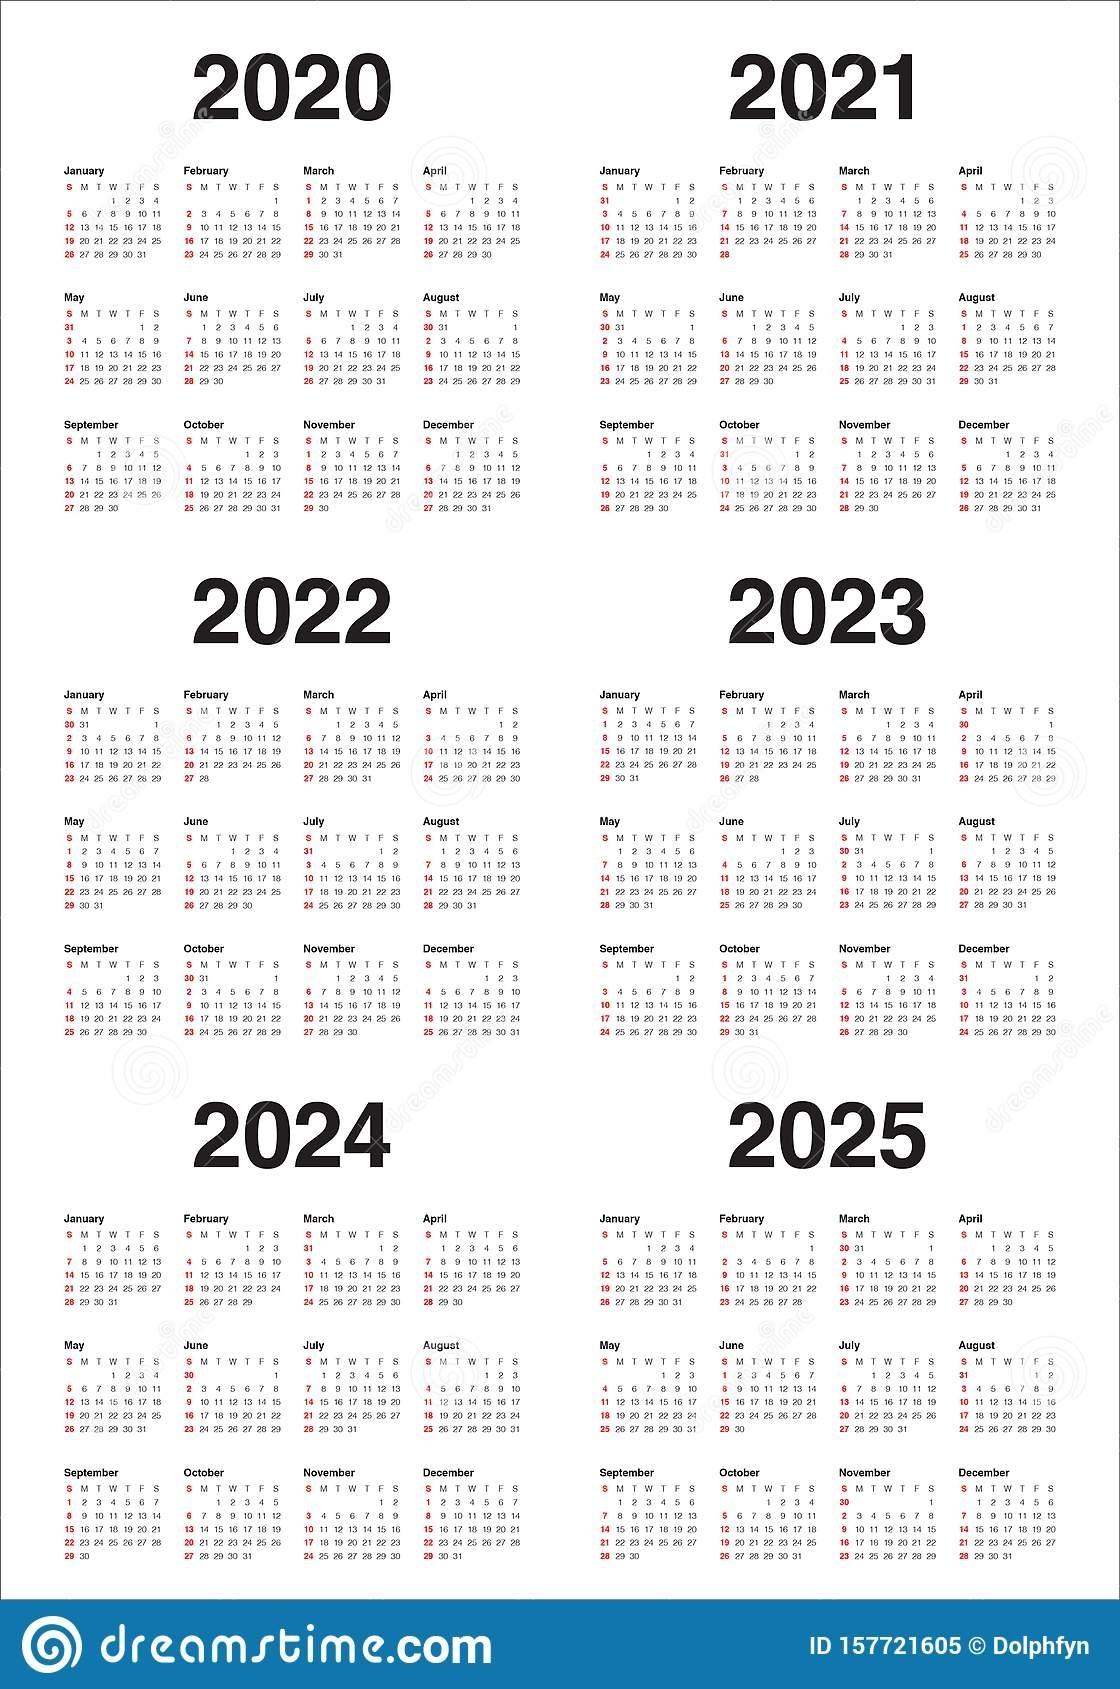 Printable 3 Year Calendars 2021 2022 2023 | Ten Free ...